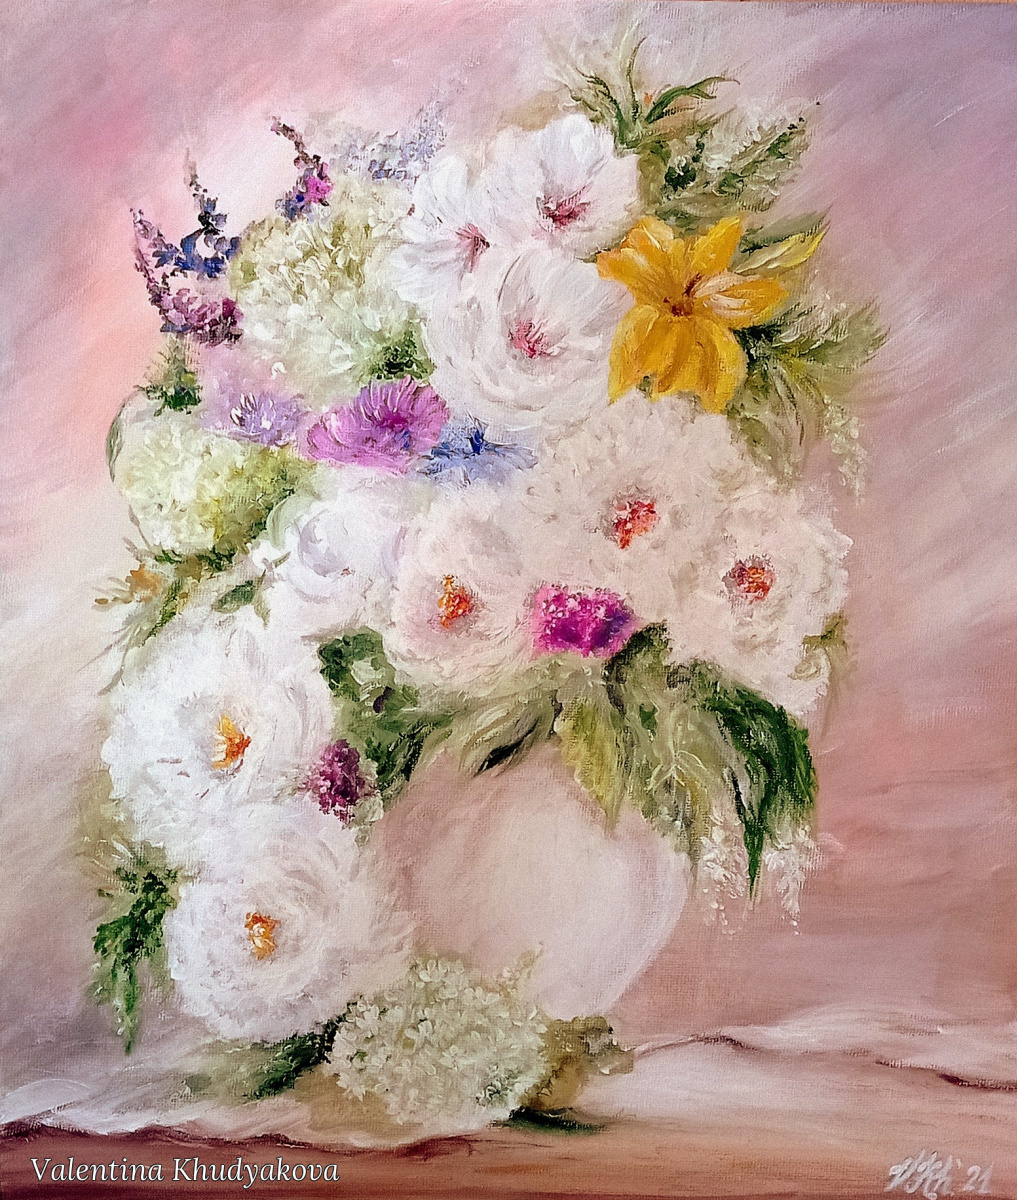 Valentina Khudyakova. Morning bouquet